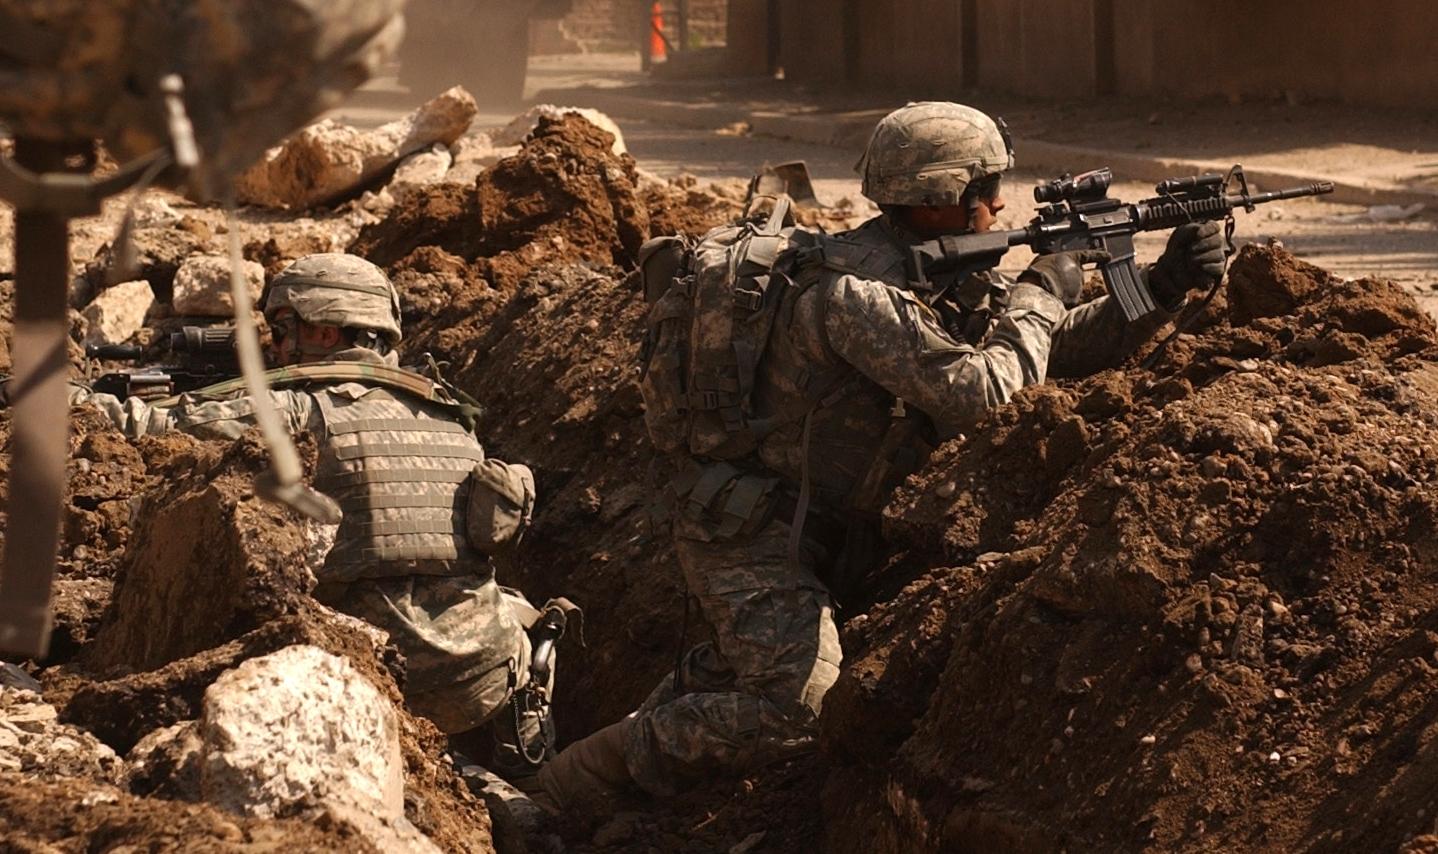 Description us army soldiers in a firefight near al doura, baghdad